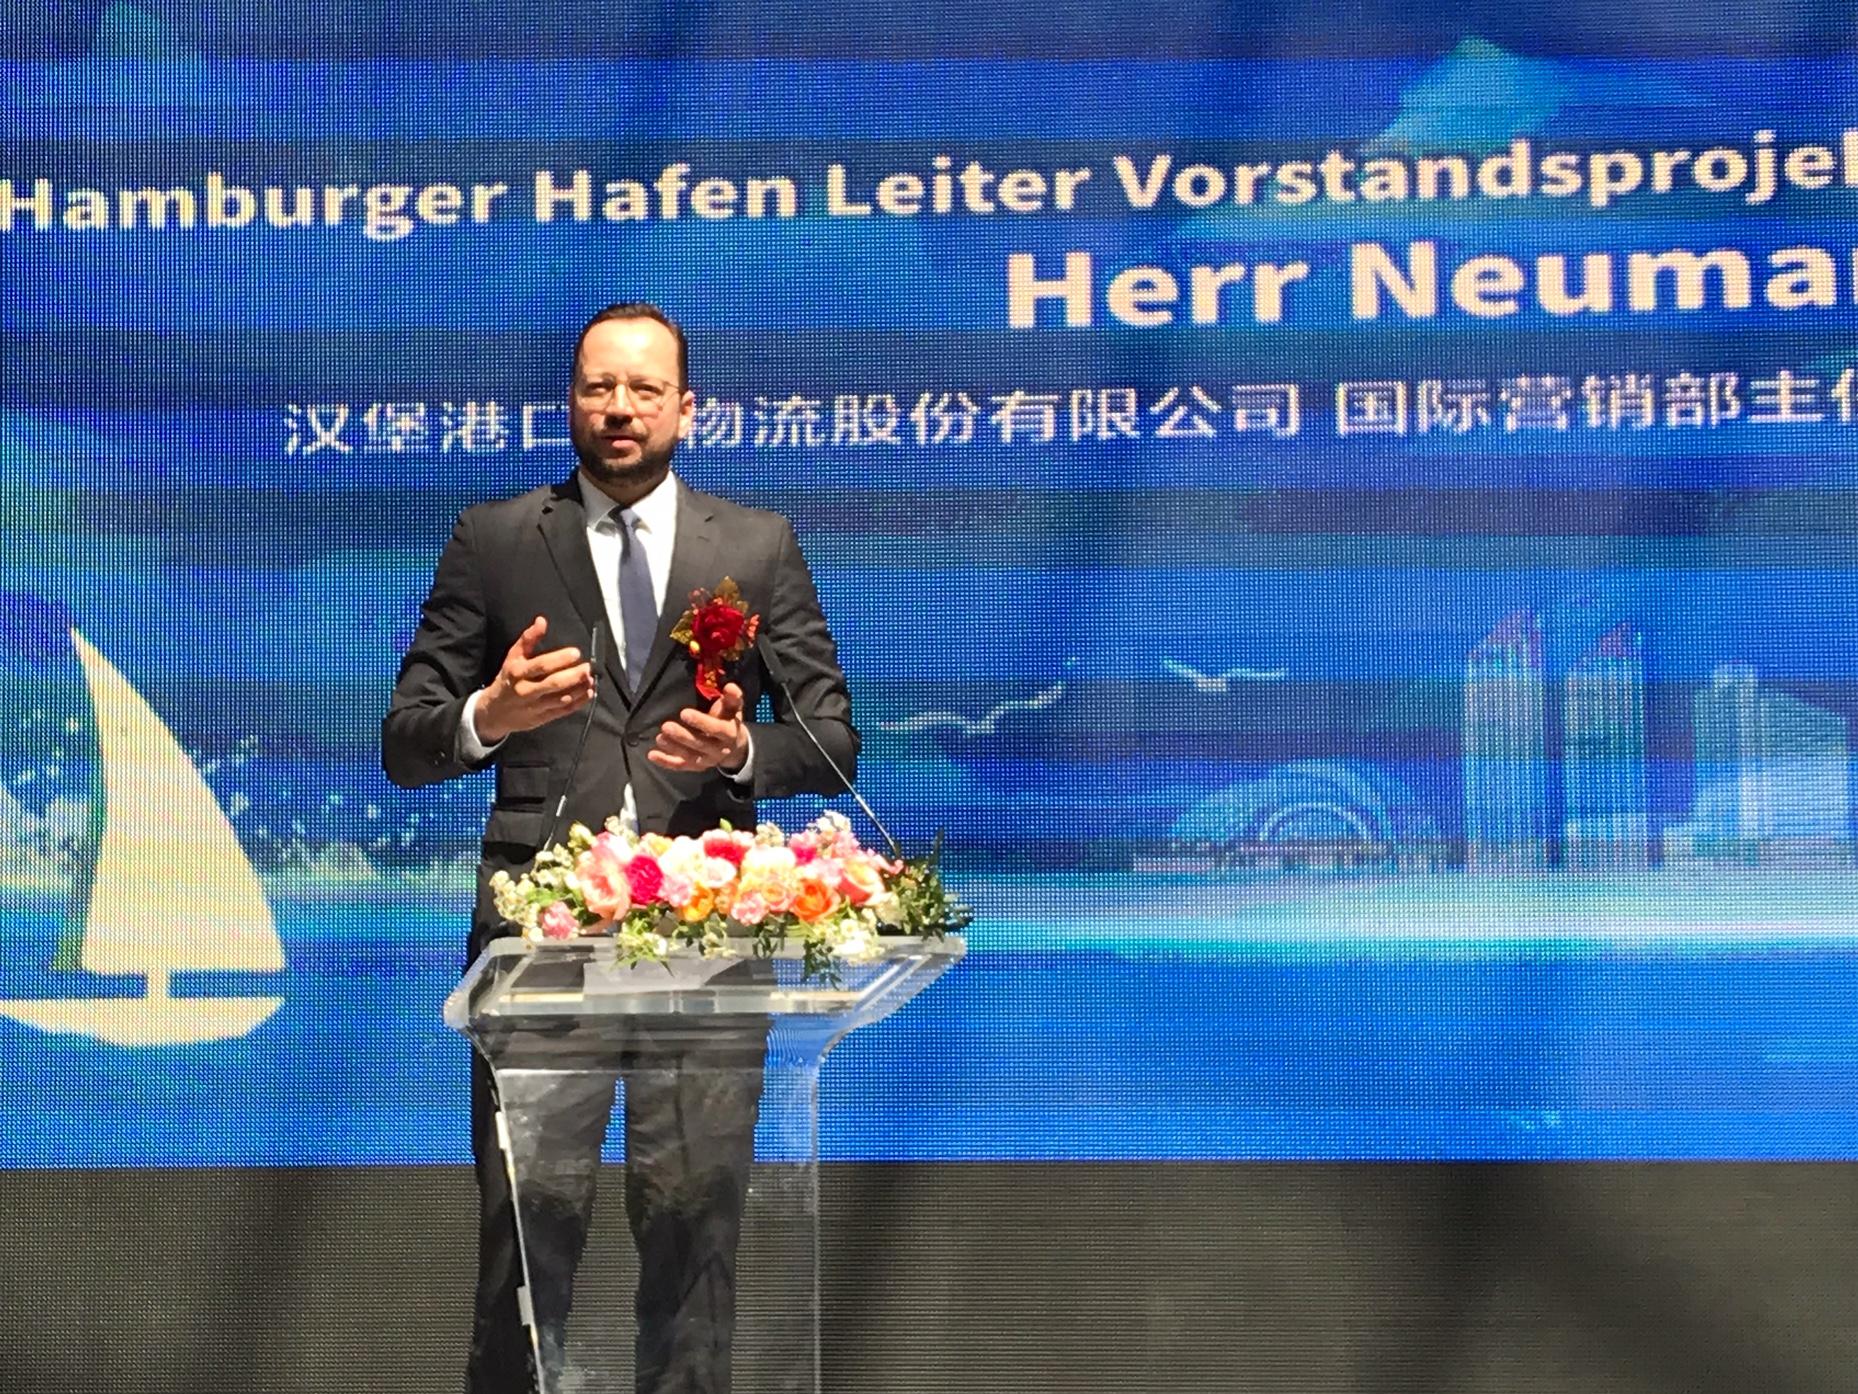 Lars Neumann unterstreicht das Kooperationspotenzial mit Qingdao